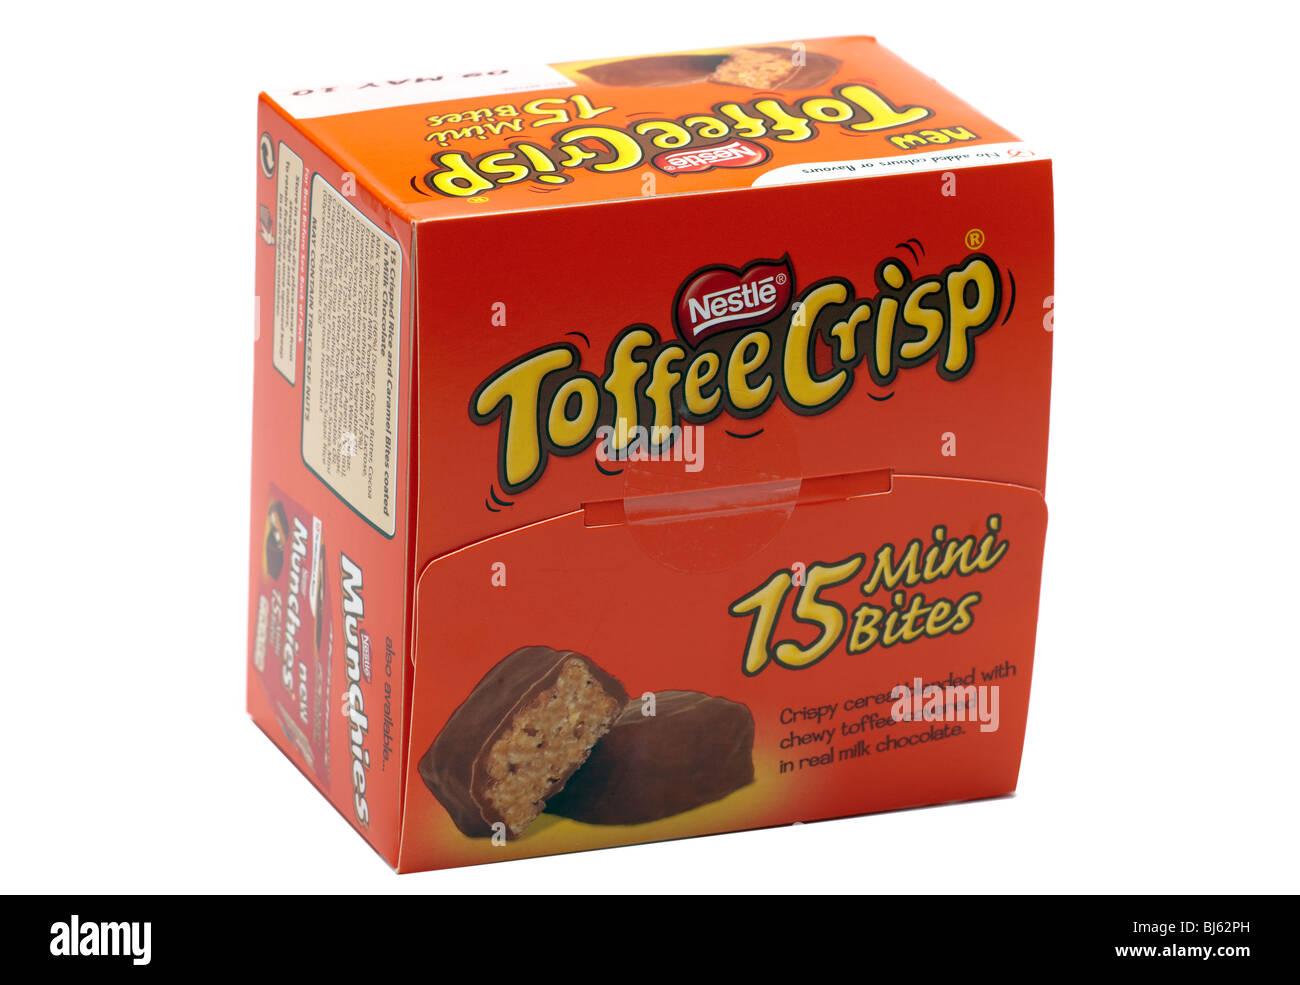 Box of Nestle toffee crisp 15 mini bites - Stock Image